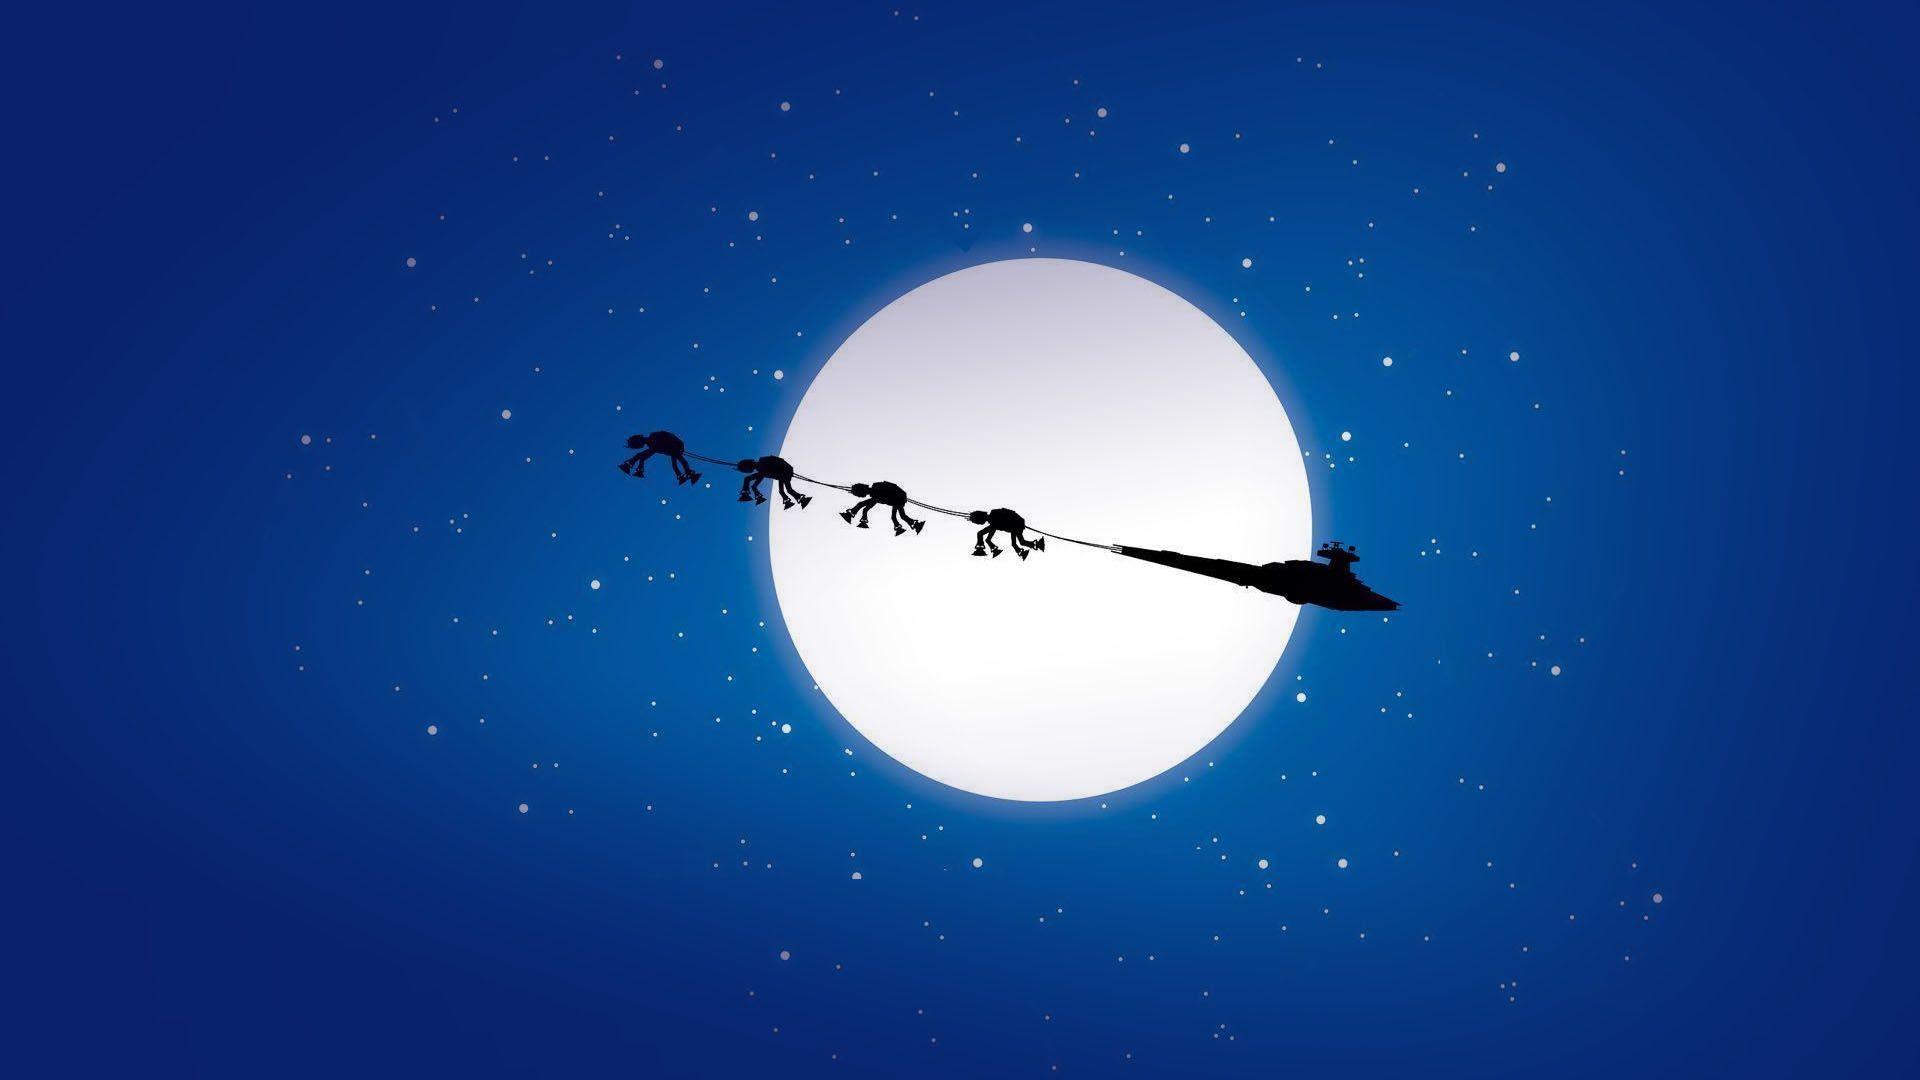 star wars desktop backgrounds christmas